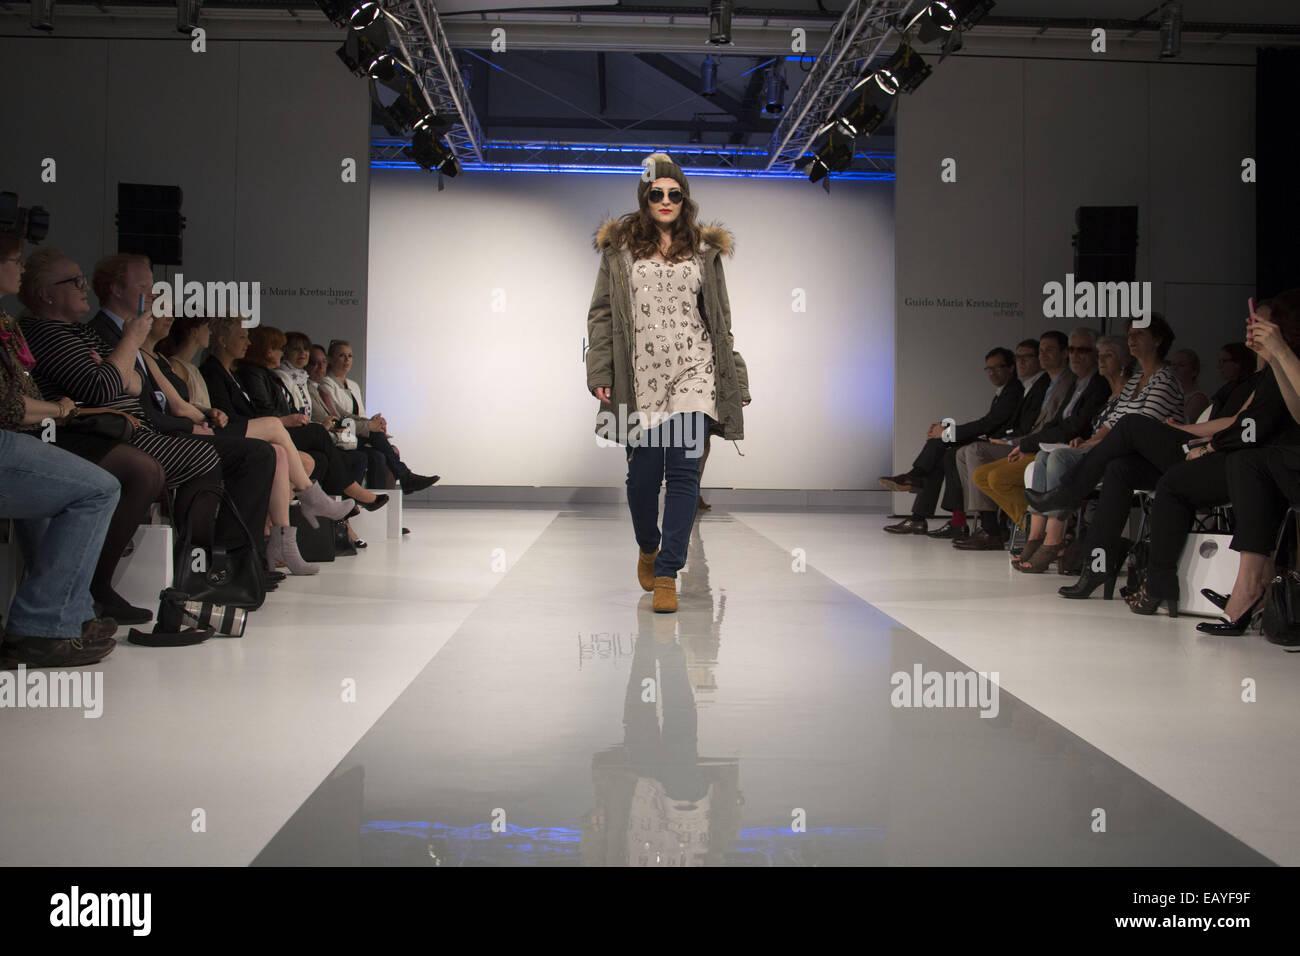 German fashion designer Guido Maria Kretschmer present his Guido Maria  Kretschmer by heine collection at Briese 404c79ad81